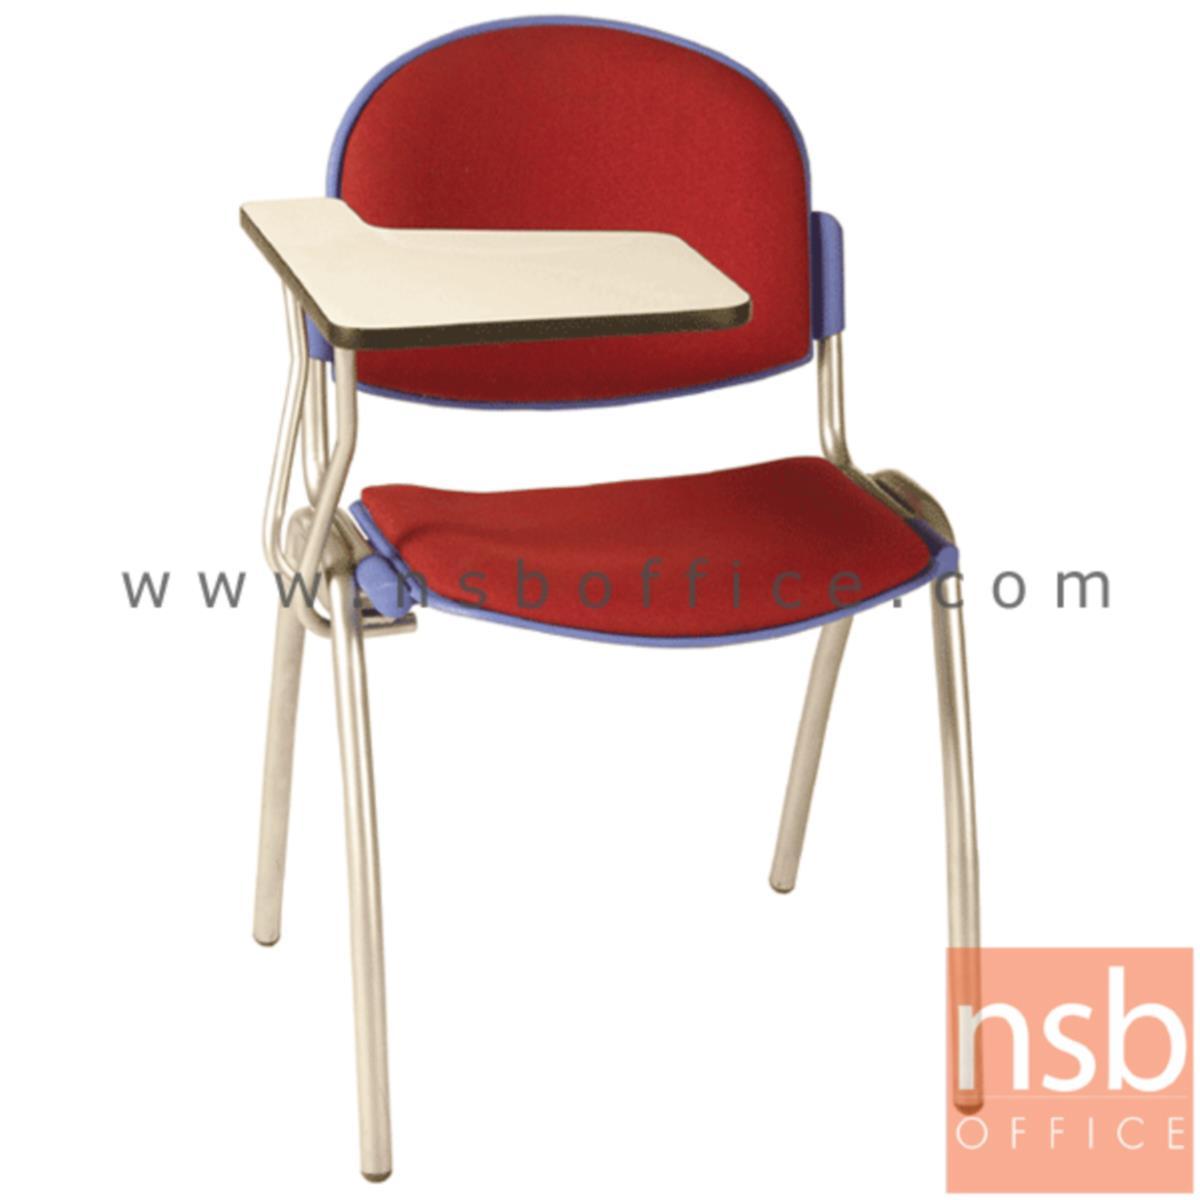 B07A052:เก้าอี้เลคเชอร์เฟรมโพลี่ รุ่น C356-746 ขาเหล็กพ่นสี